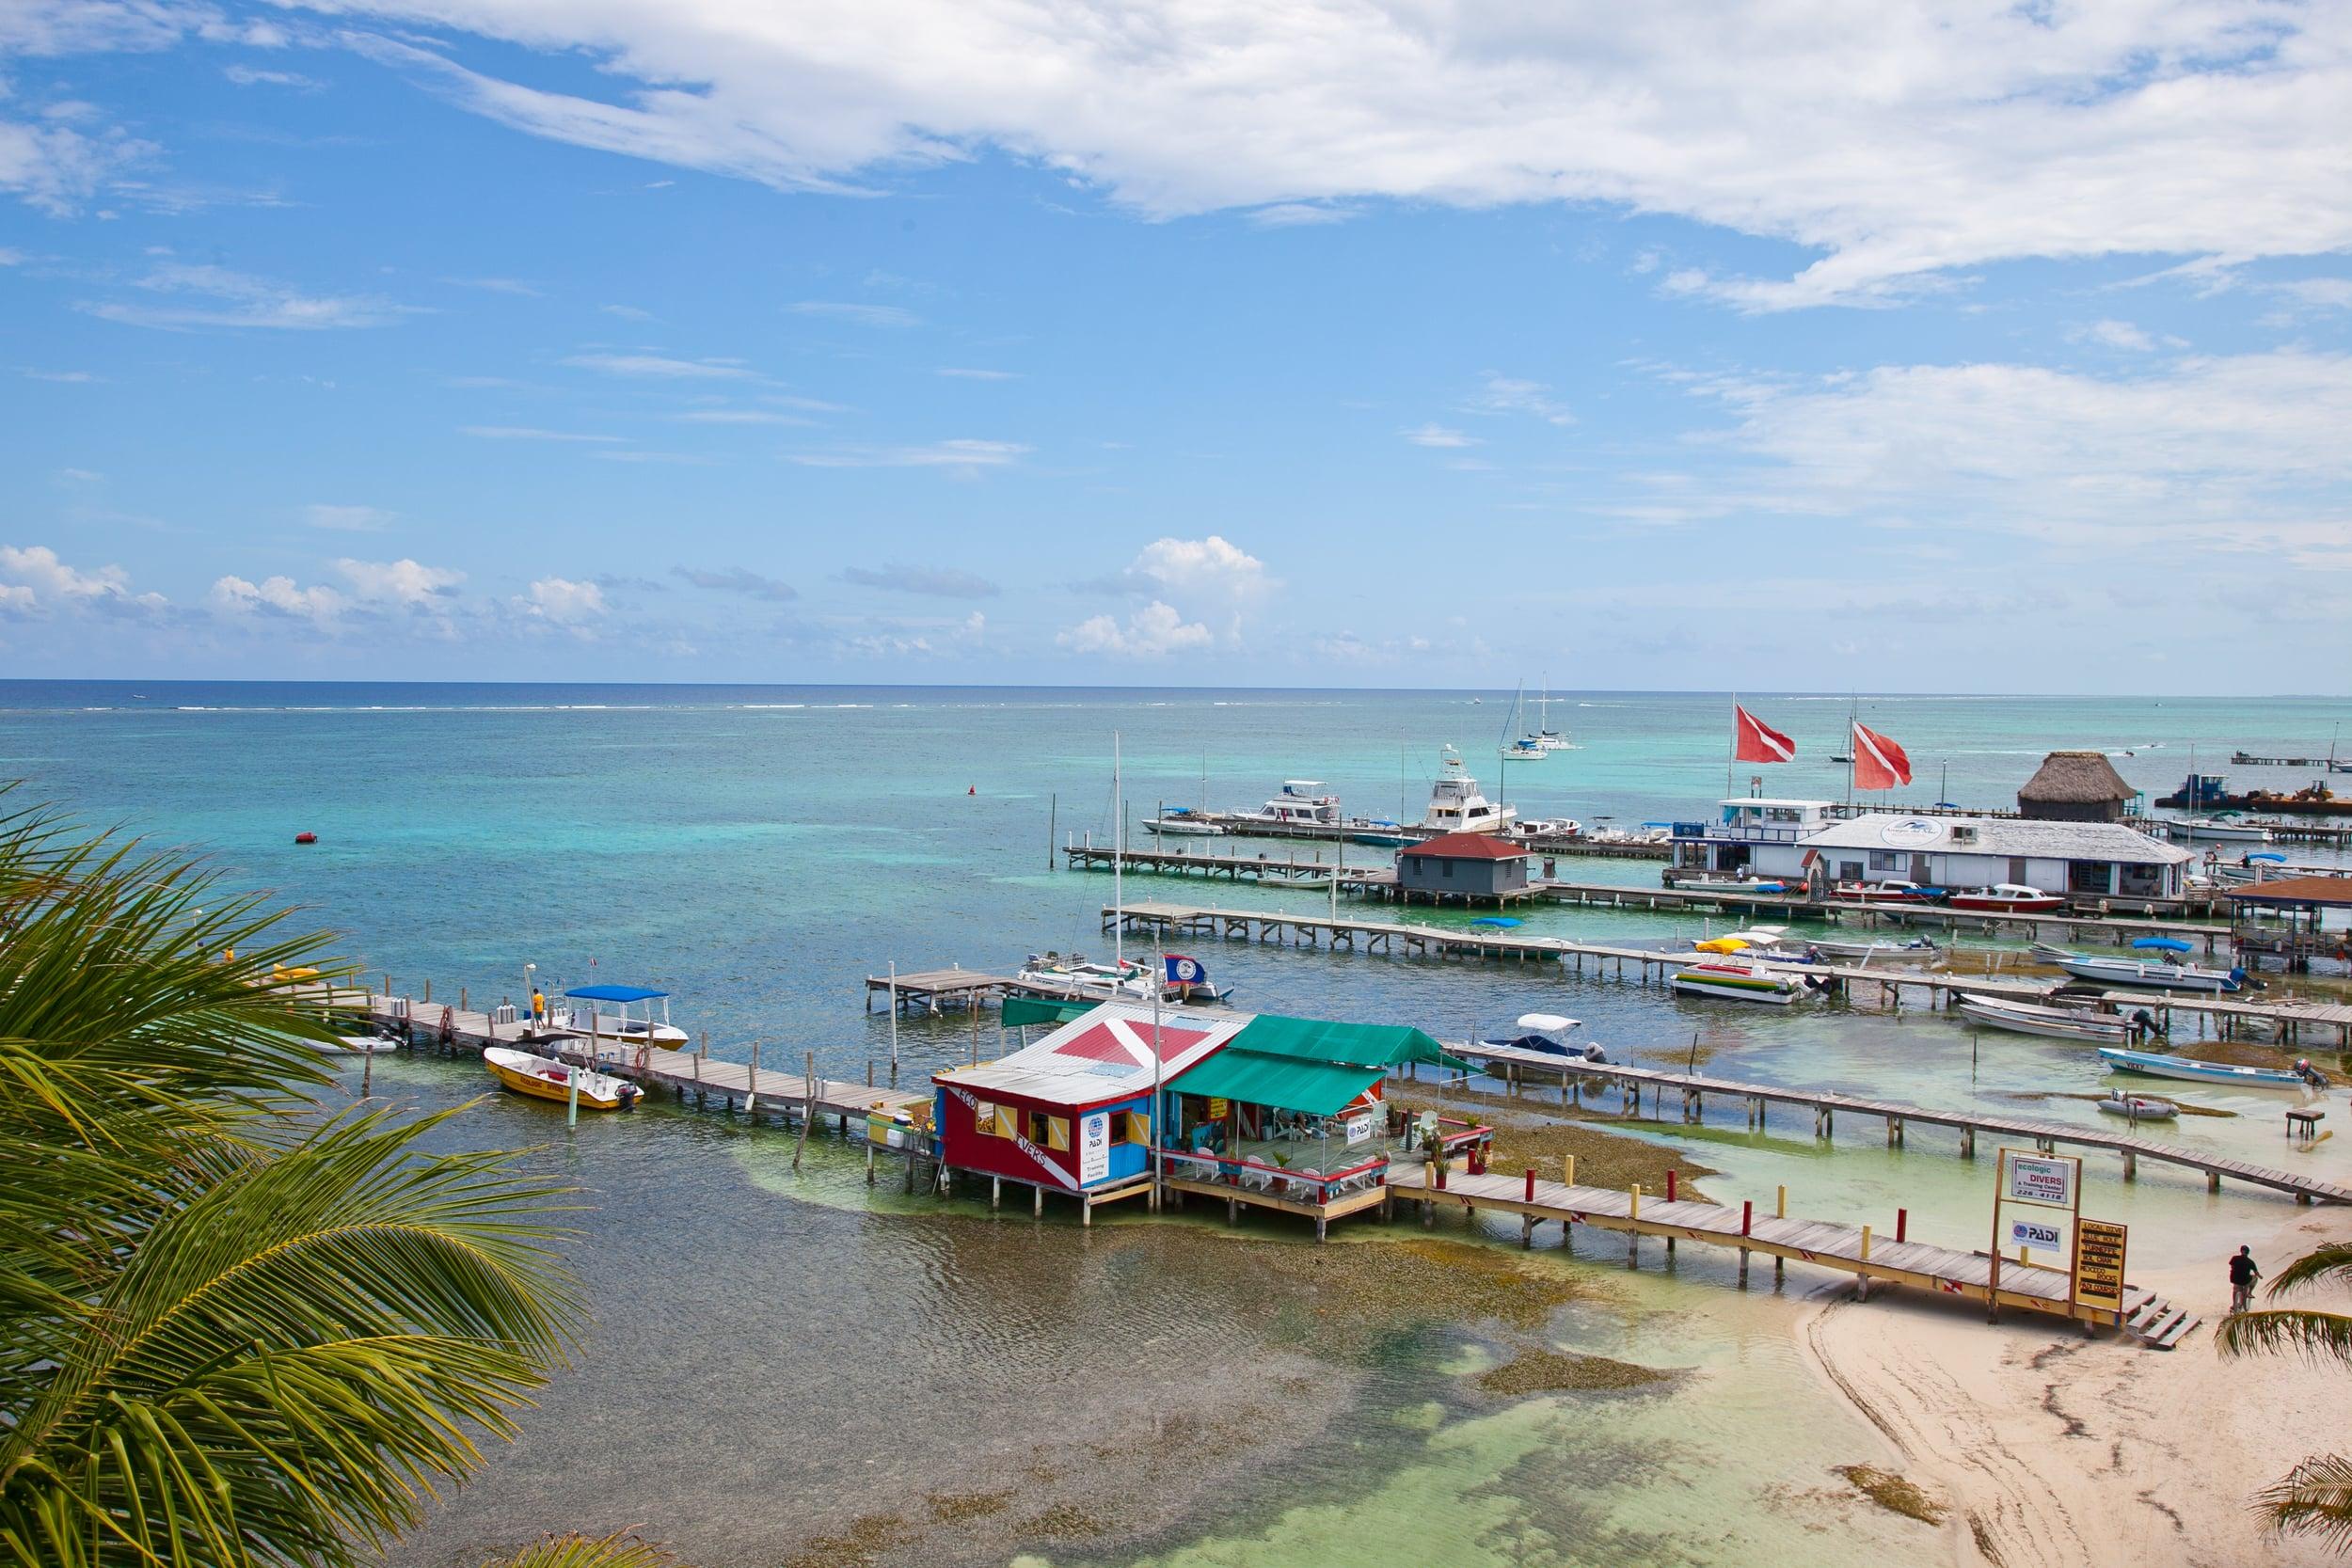 trisa-taro-beach-docks-ambergris-caye-san pedro-belize.jpg